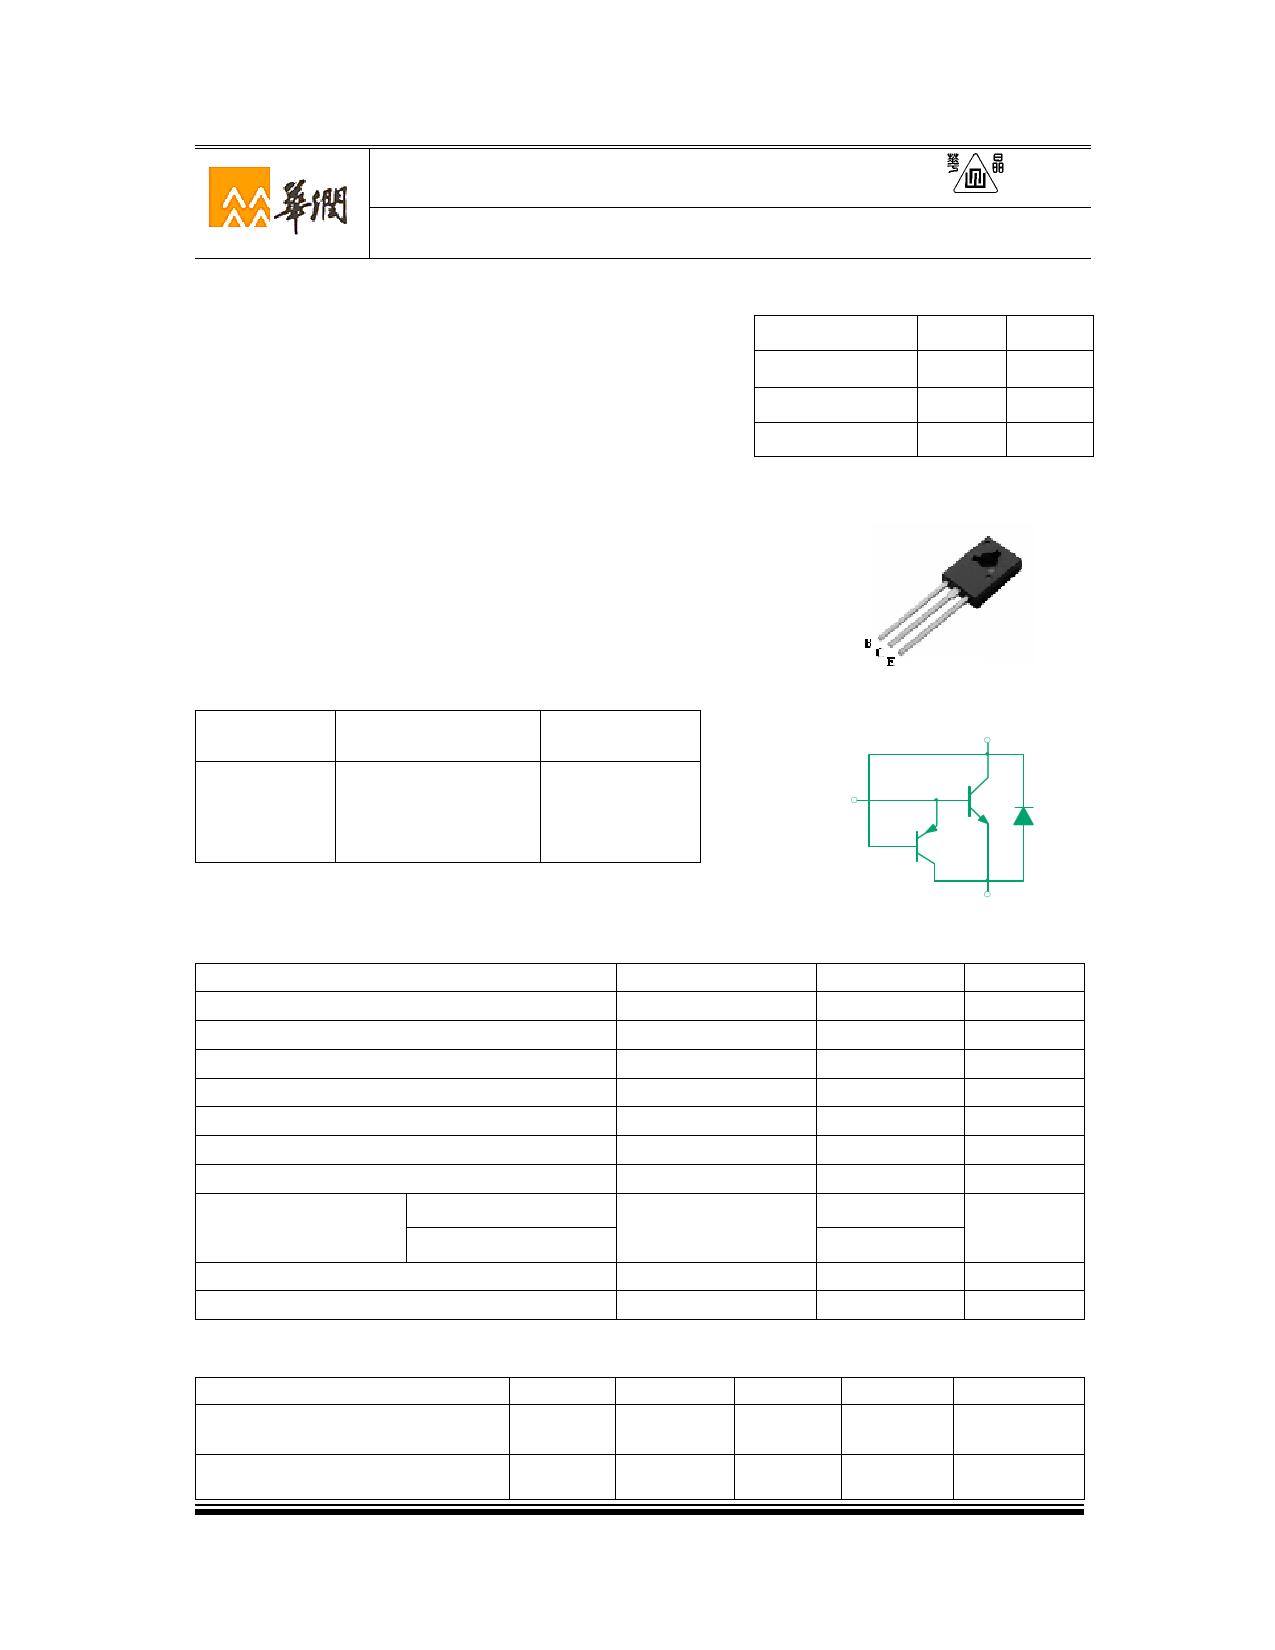 3DD13003E6D Datasheet, 3DD13003E6D PDF,ピン配置, 機能